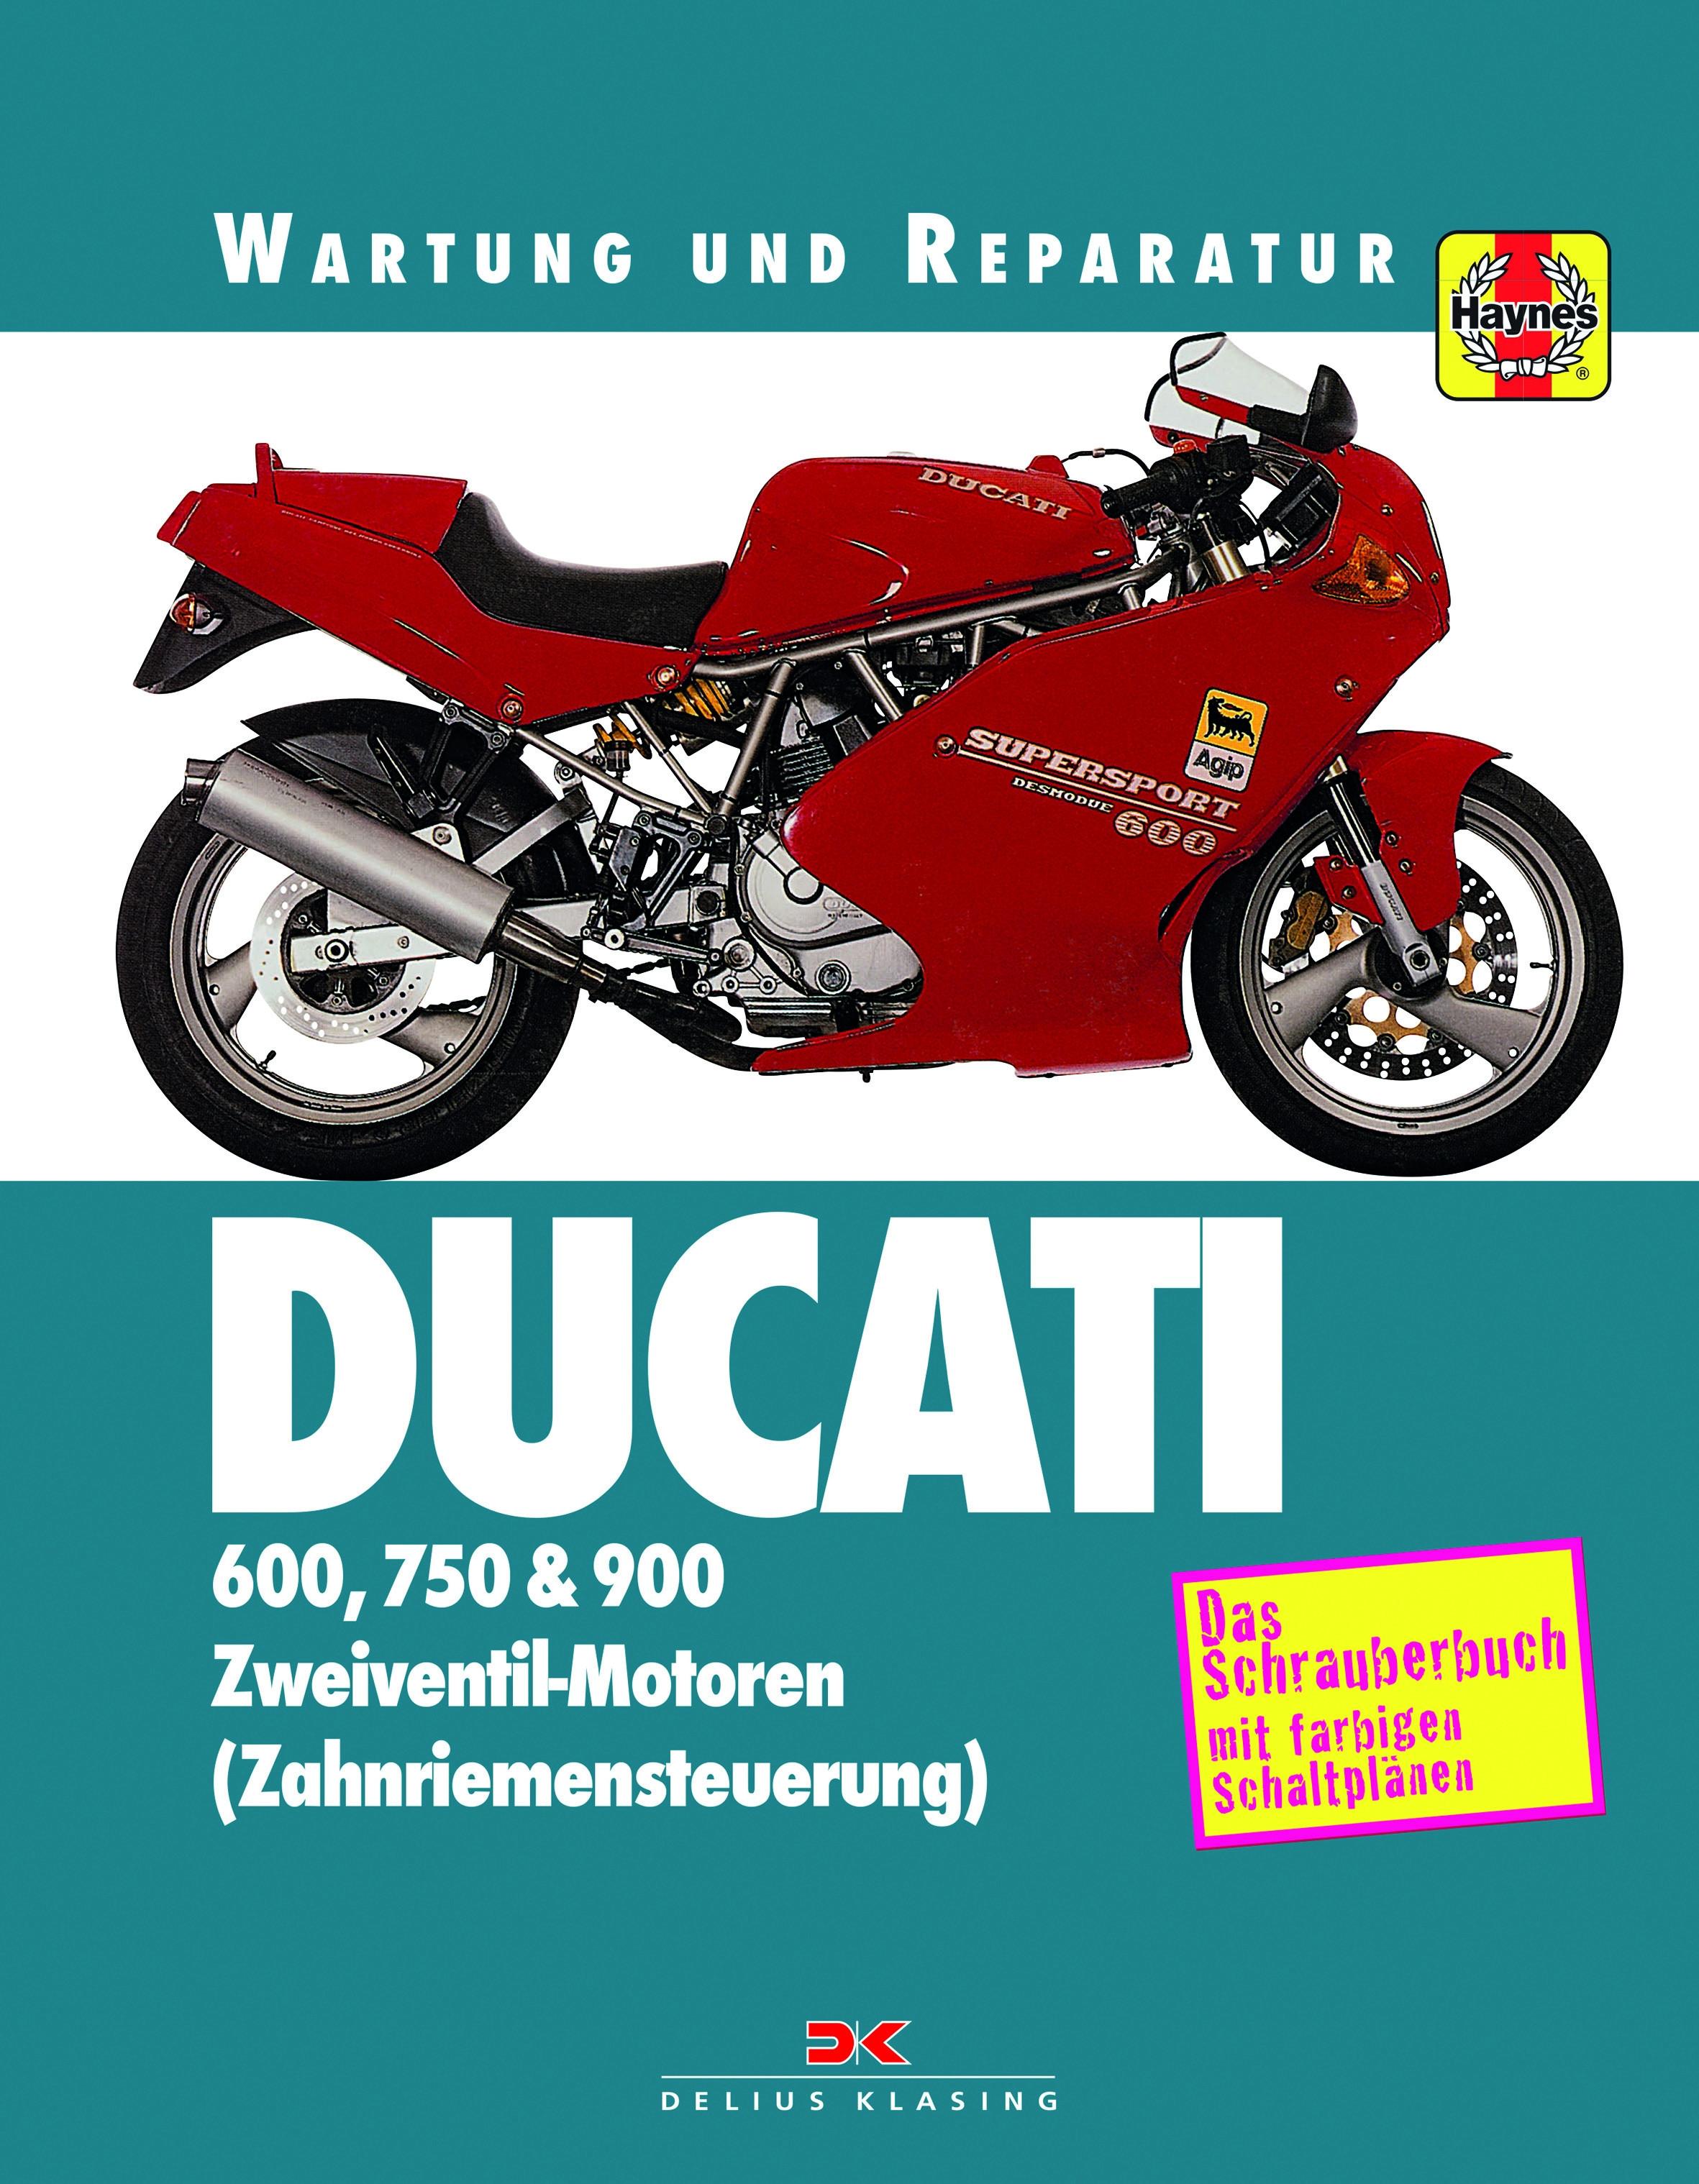 Ducati 600 / 750 / 900 M / SS Reparaturanleitung Wartung und Reparatur